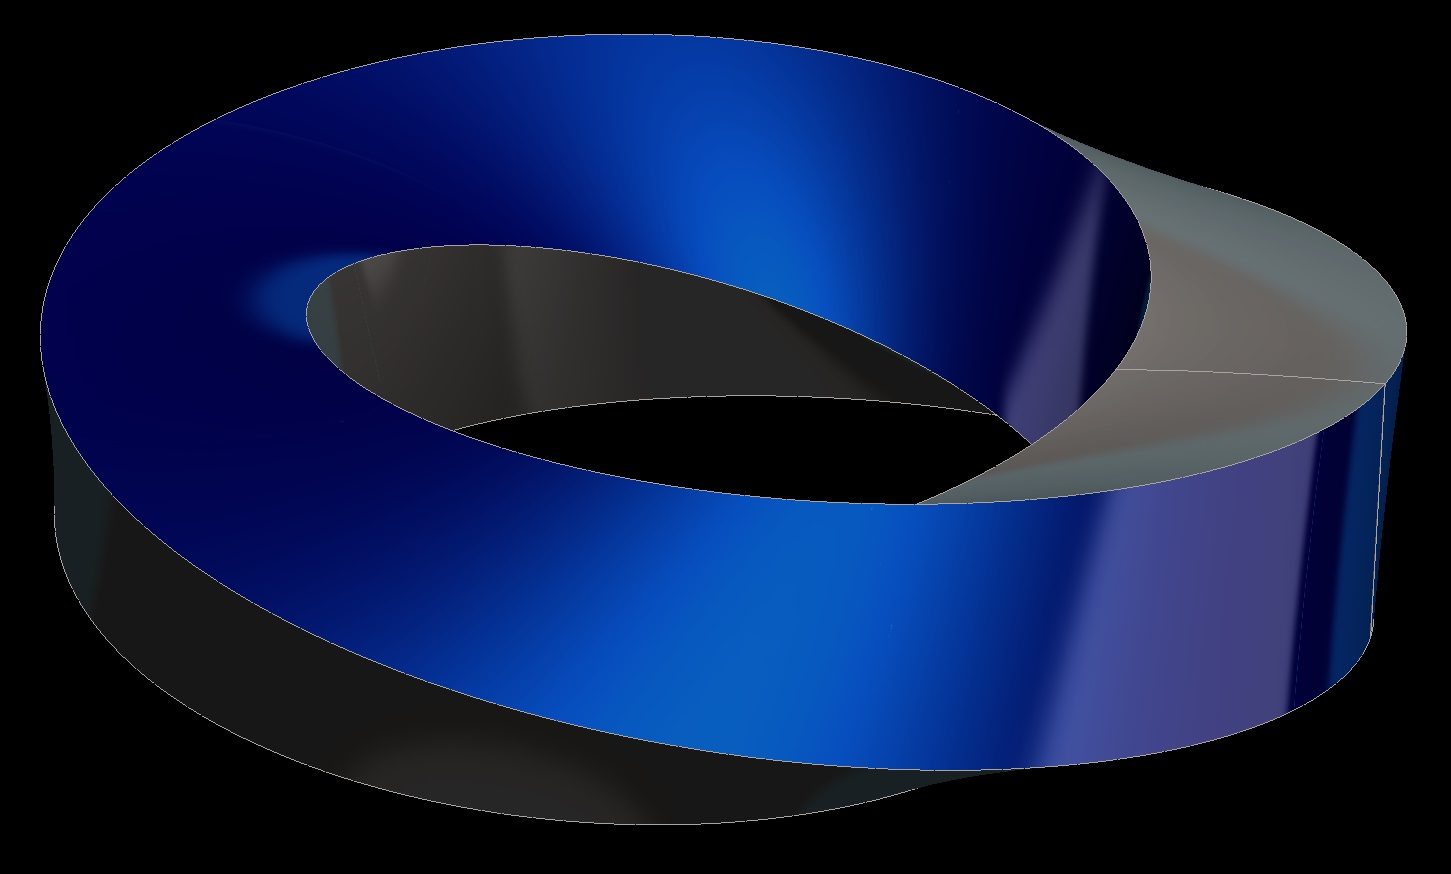 MOBIUS_STRIP-03.jpg